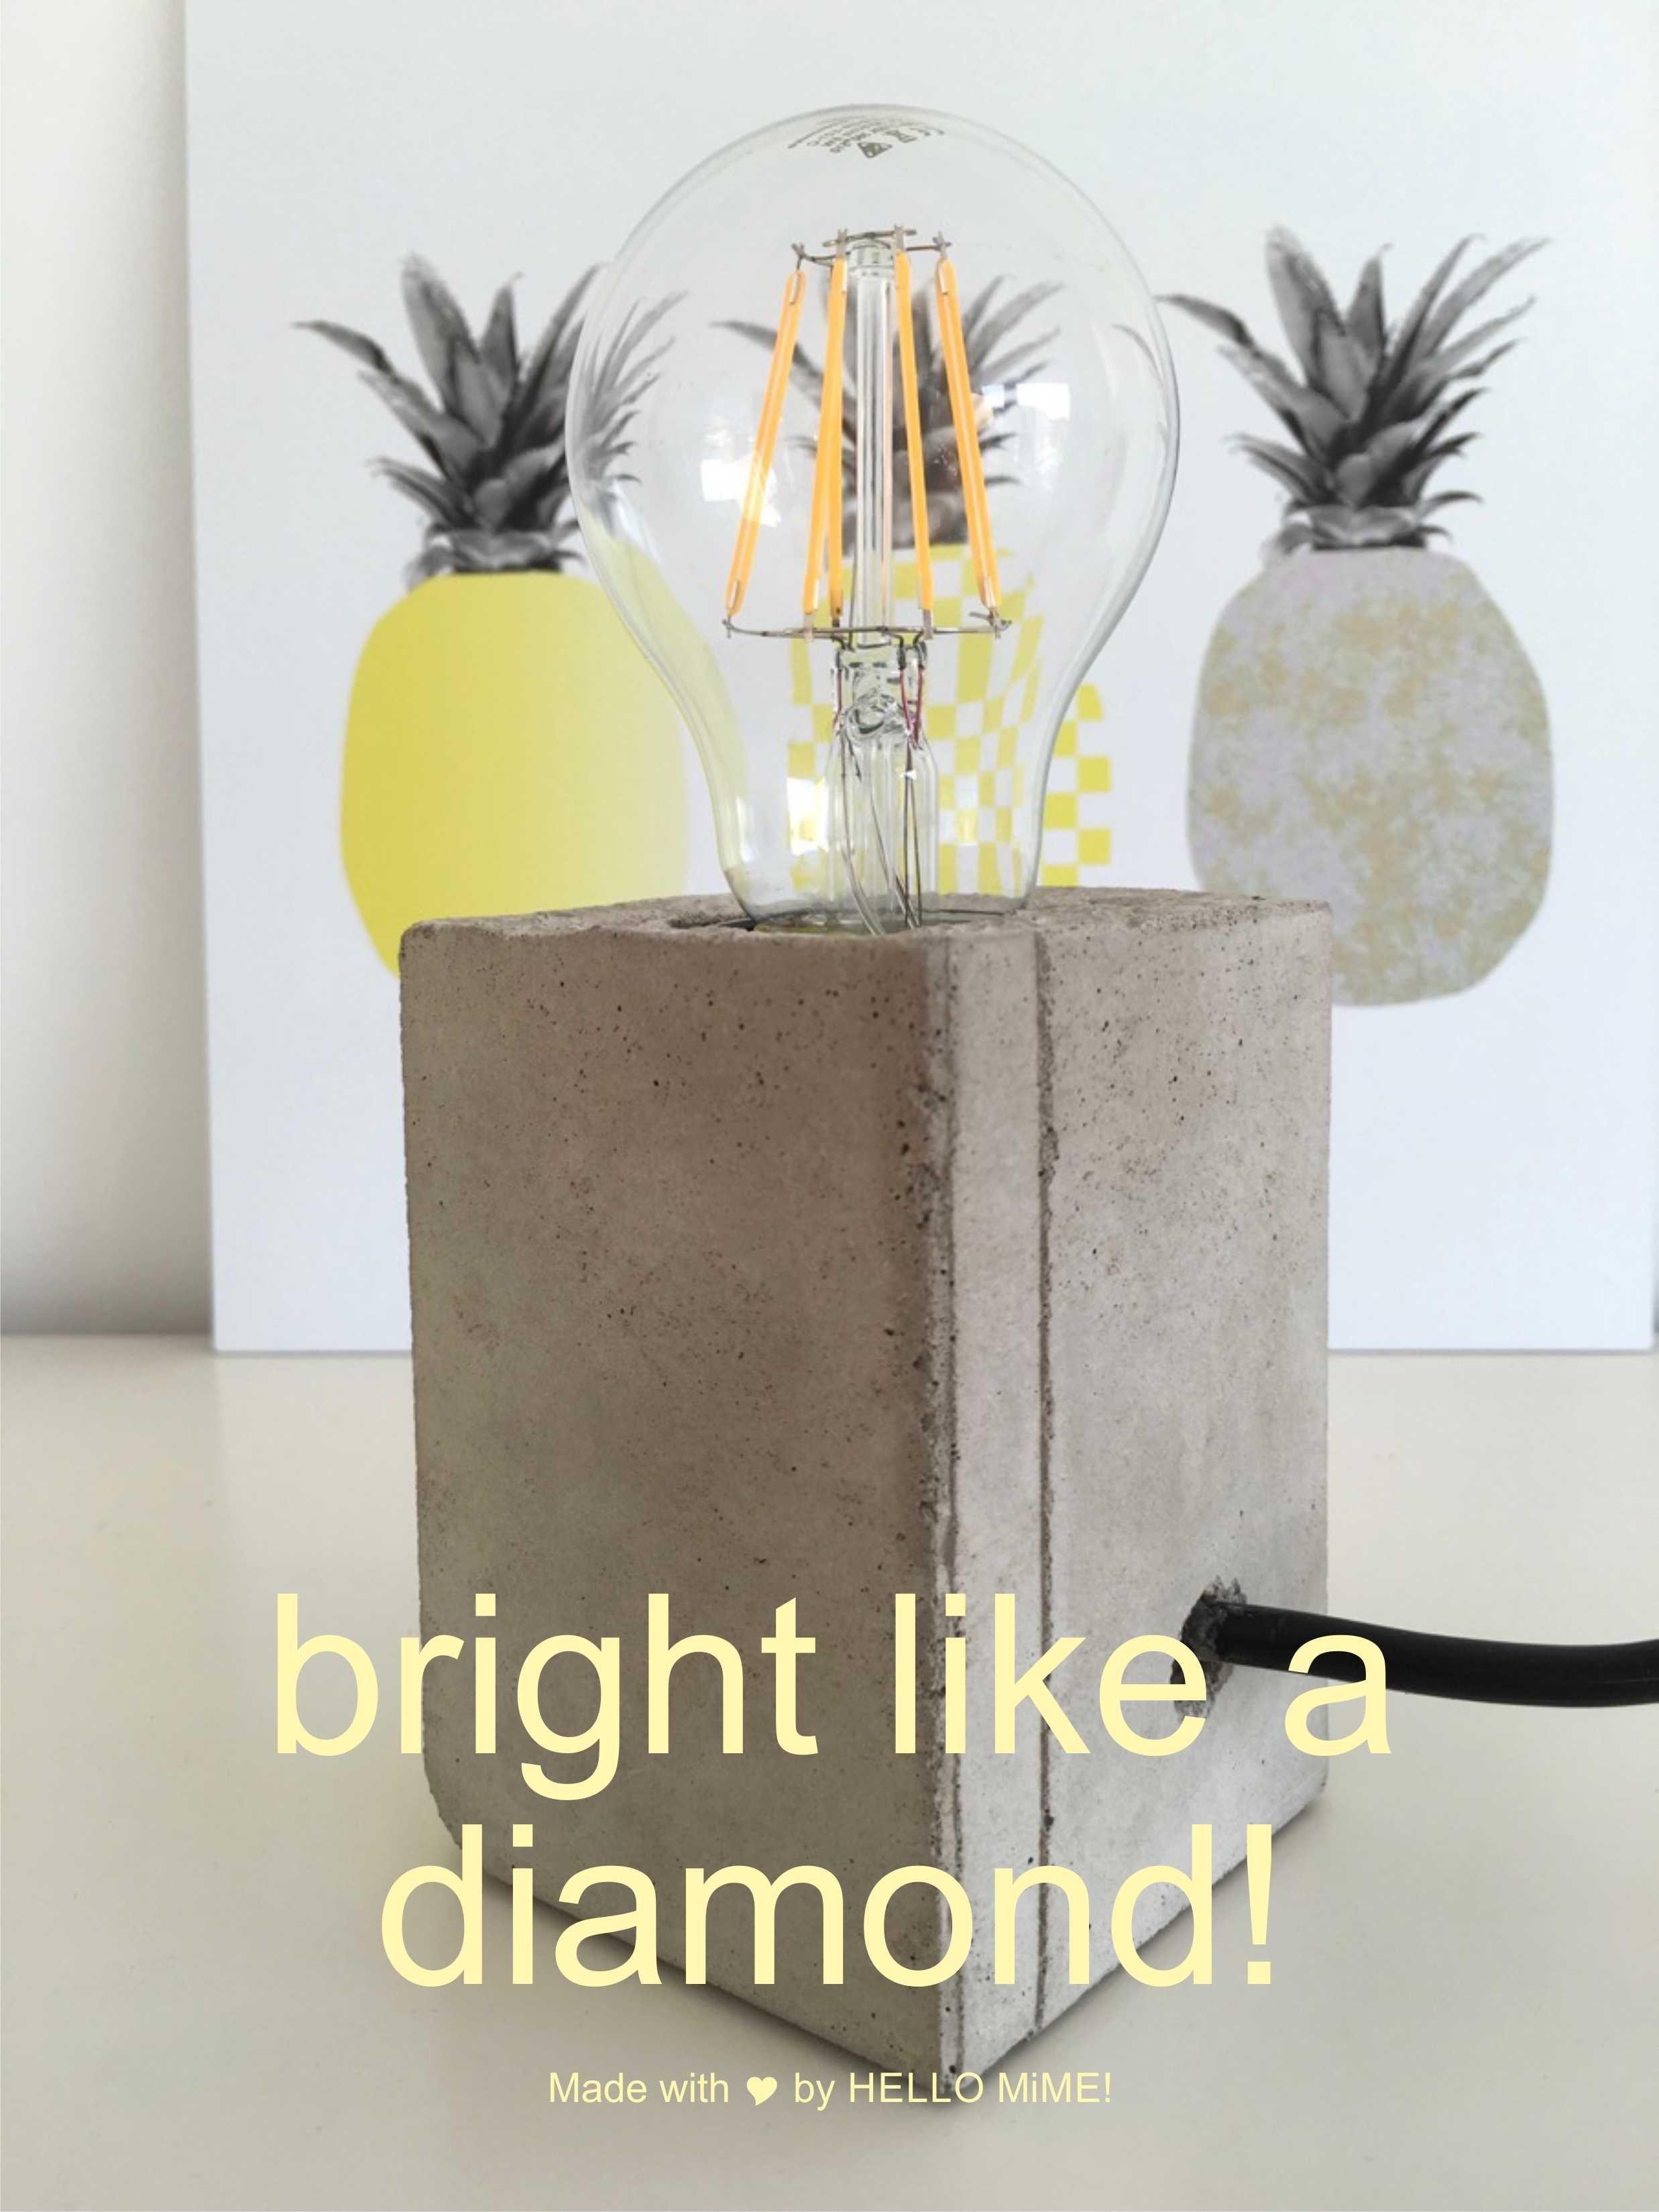 lampe mit sockel aus beton selbermachen beton. Black Bedroom Furniture Sets. Home Design Ideas